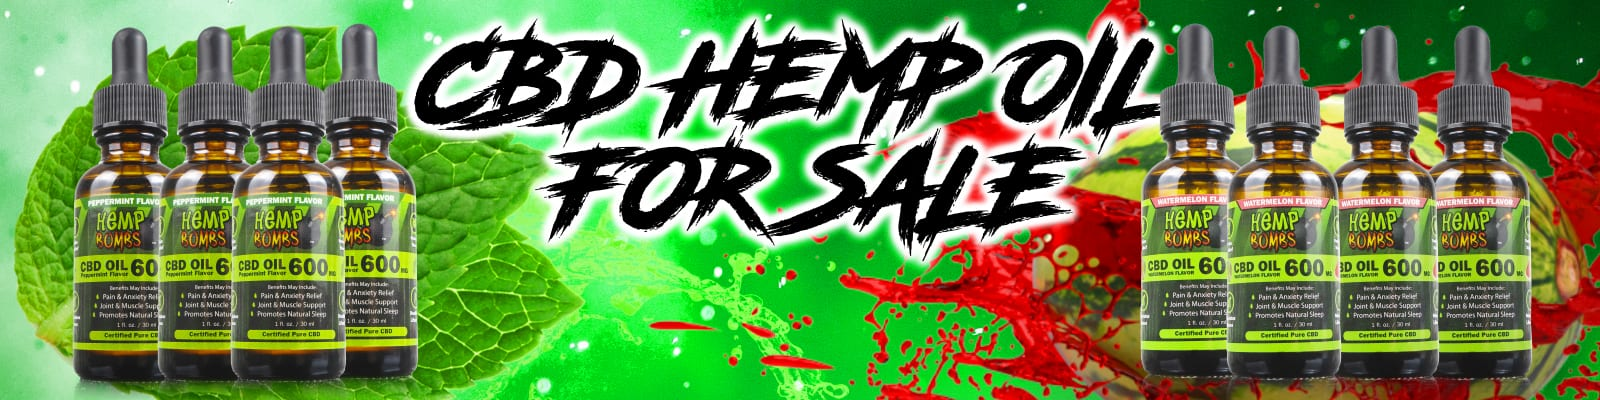 CBD Hemp Oil for Sale